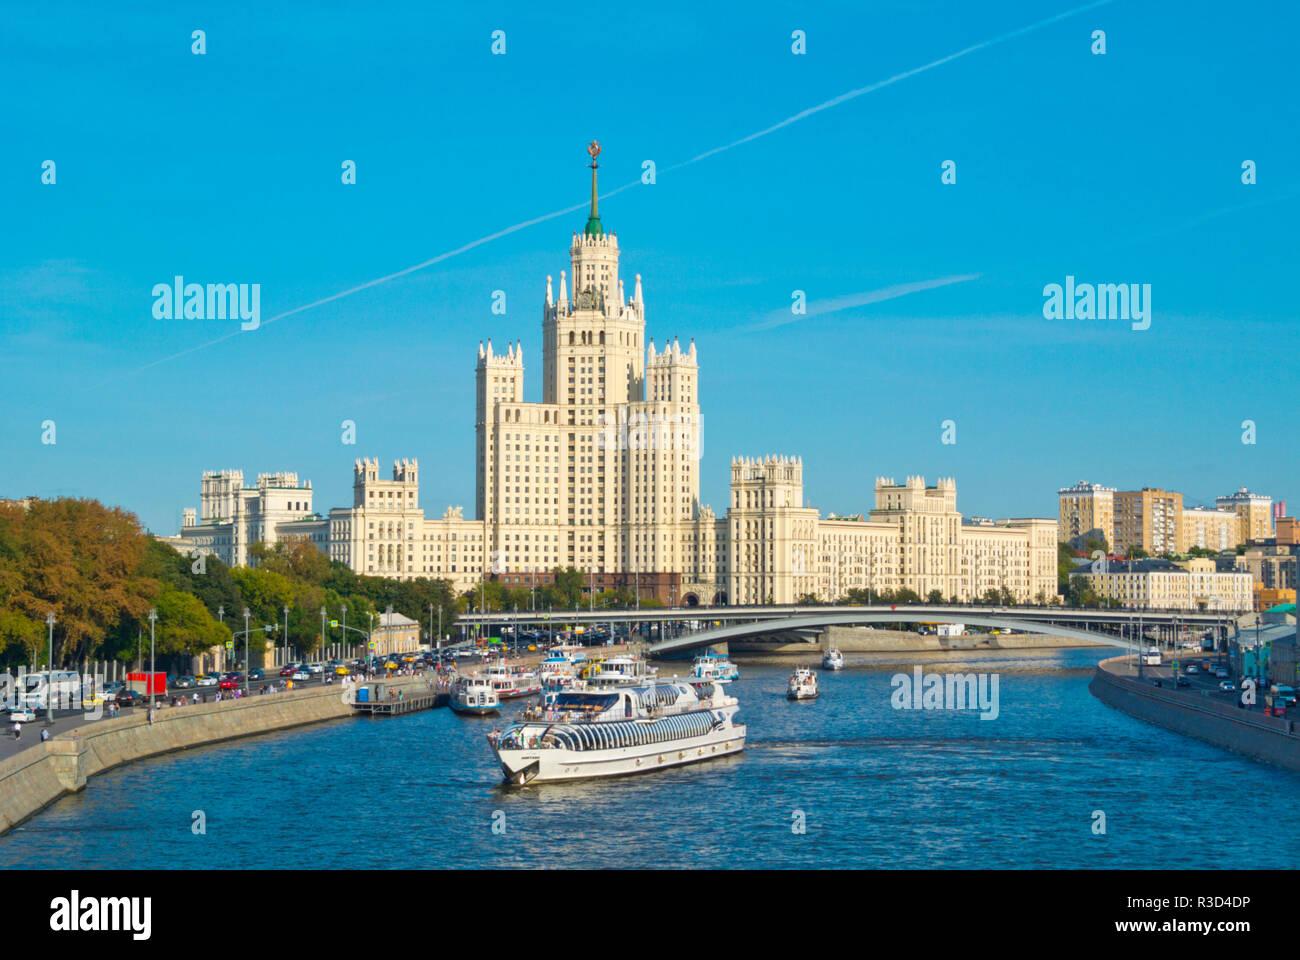 Moskva River, at Zaryadye Park, with Kotelnicheskaya Embankment Building, Moscow, Russia Stock Photo